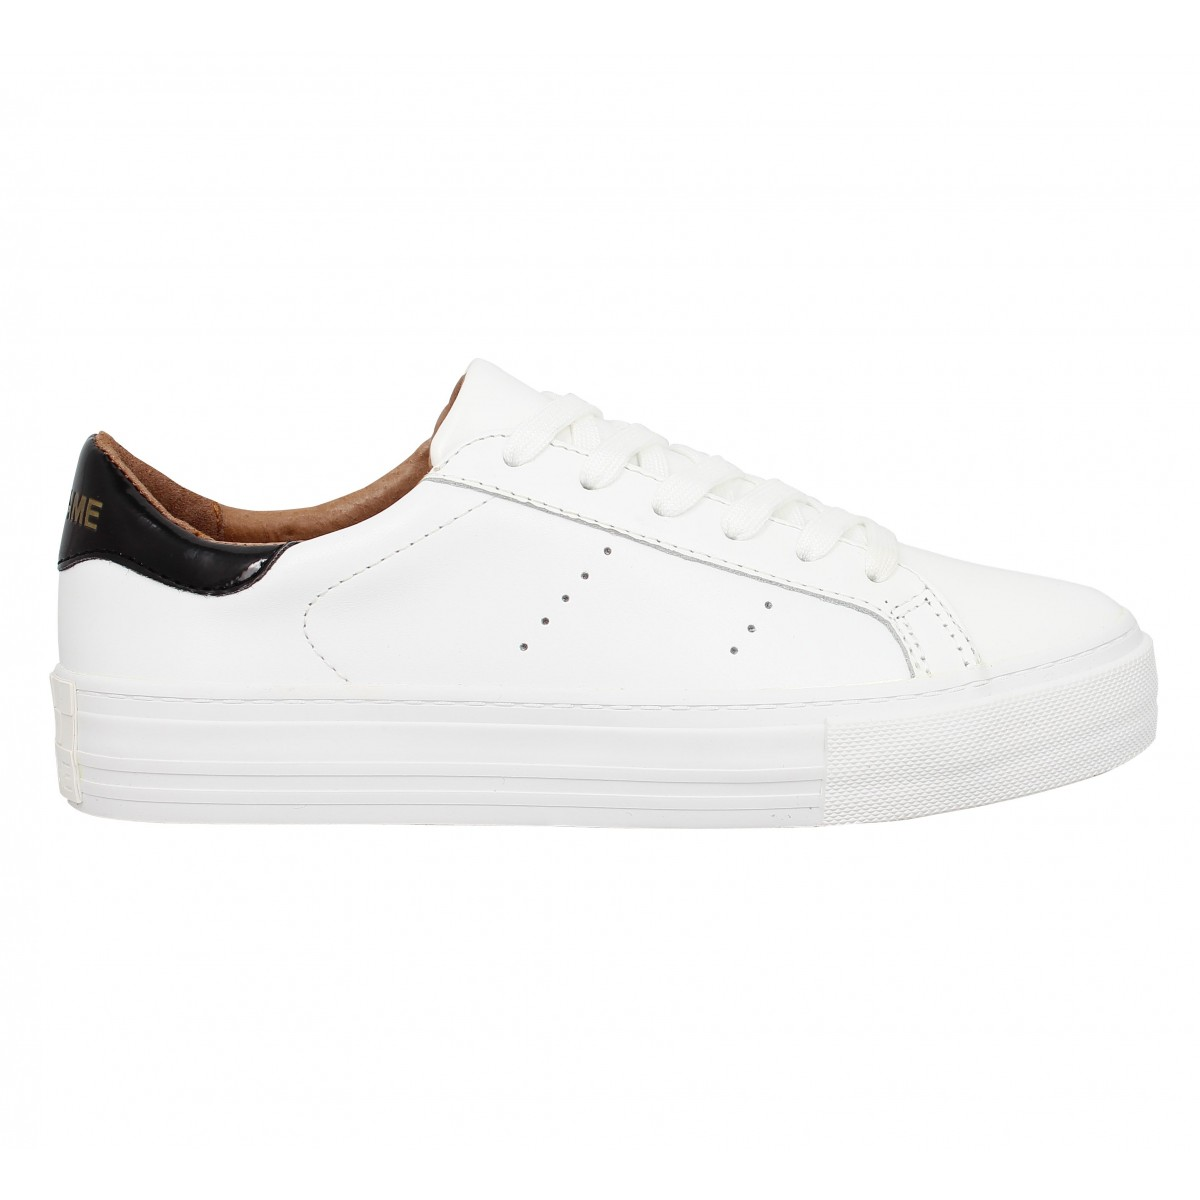 soldes no name arcade sneaker blanc femme fanny chaussures. Black Bedroom Furniture Sets. Home Design Ideas